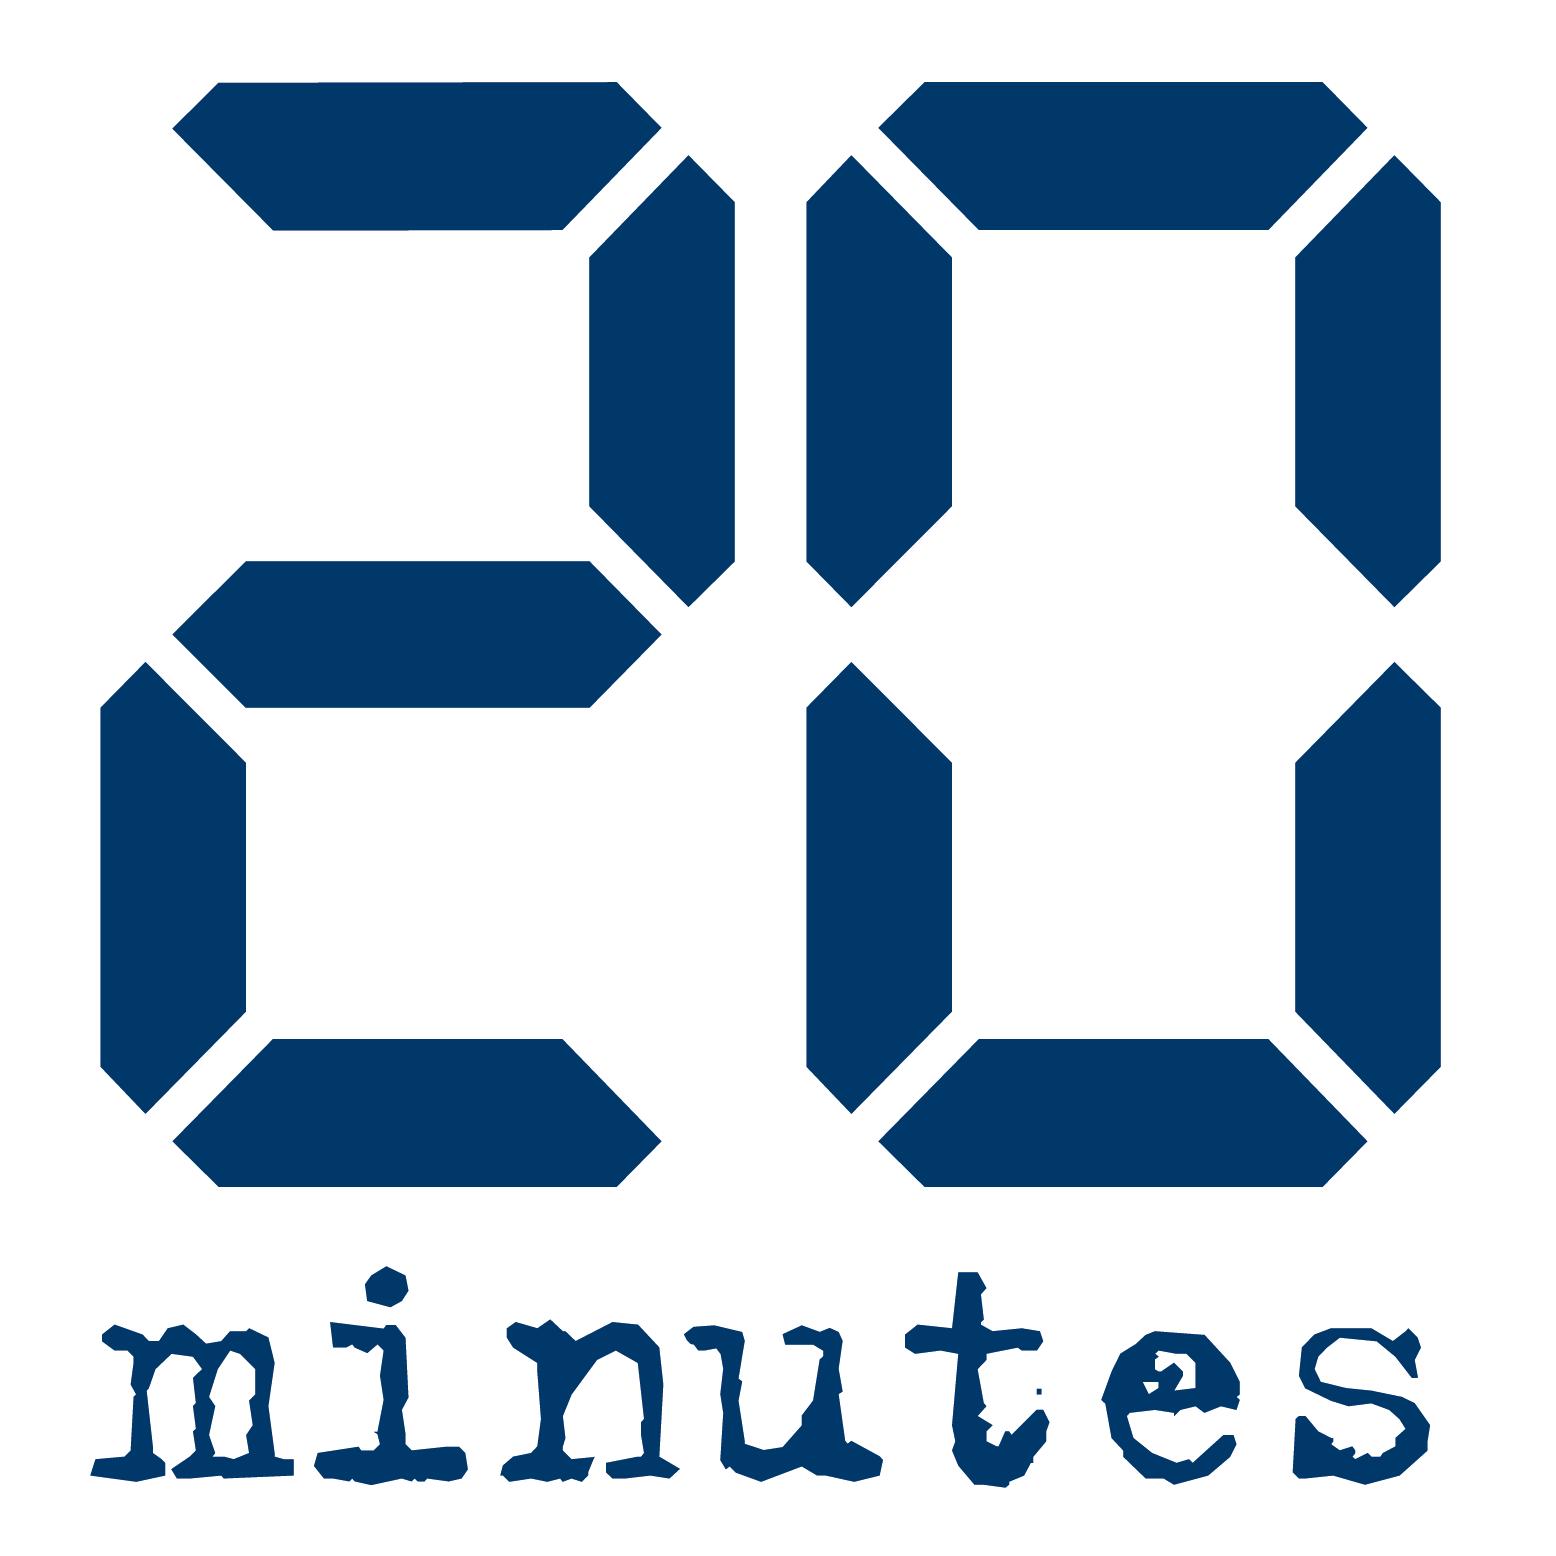 20 minutes